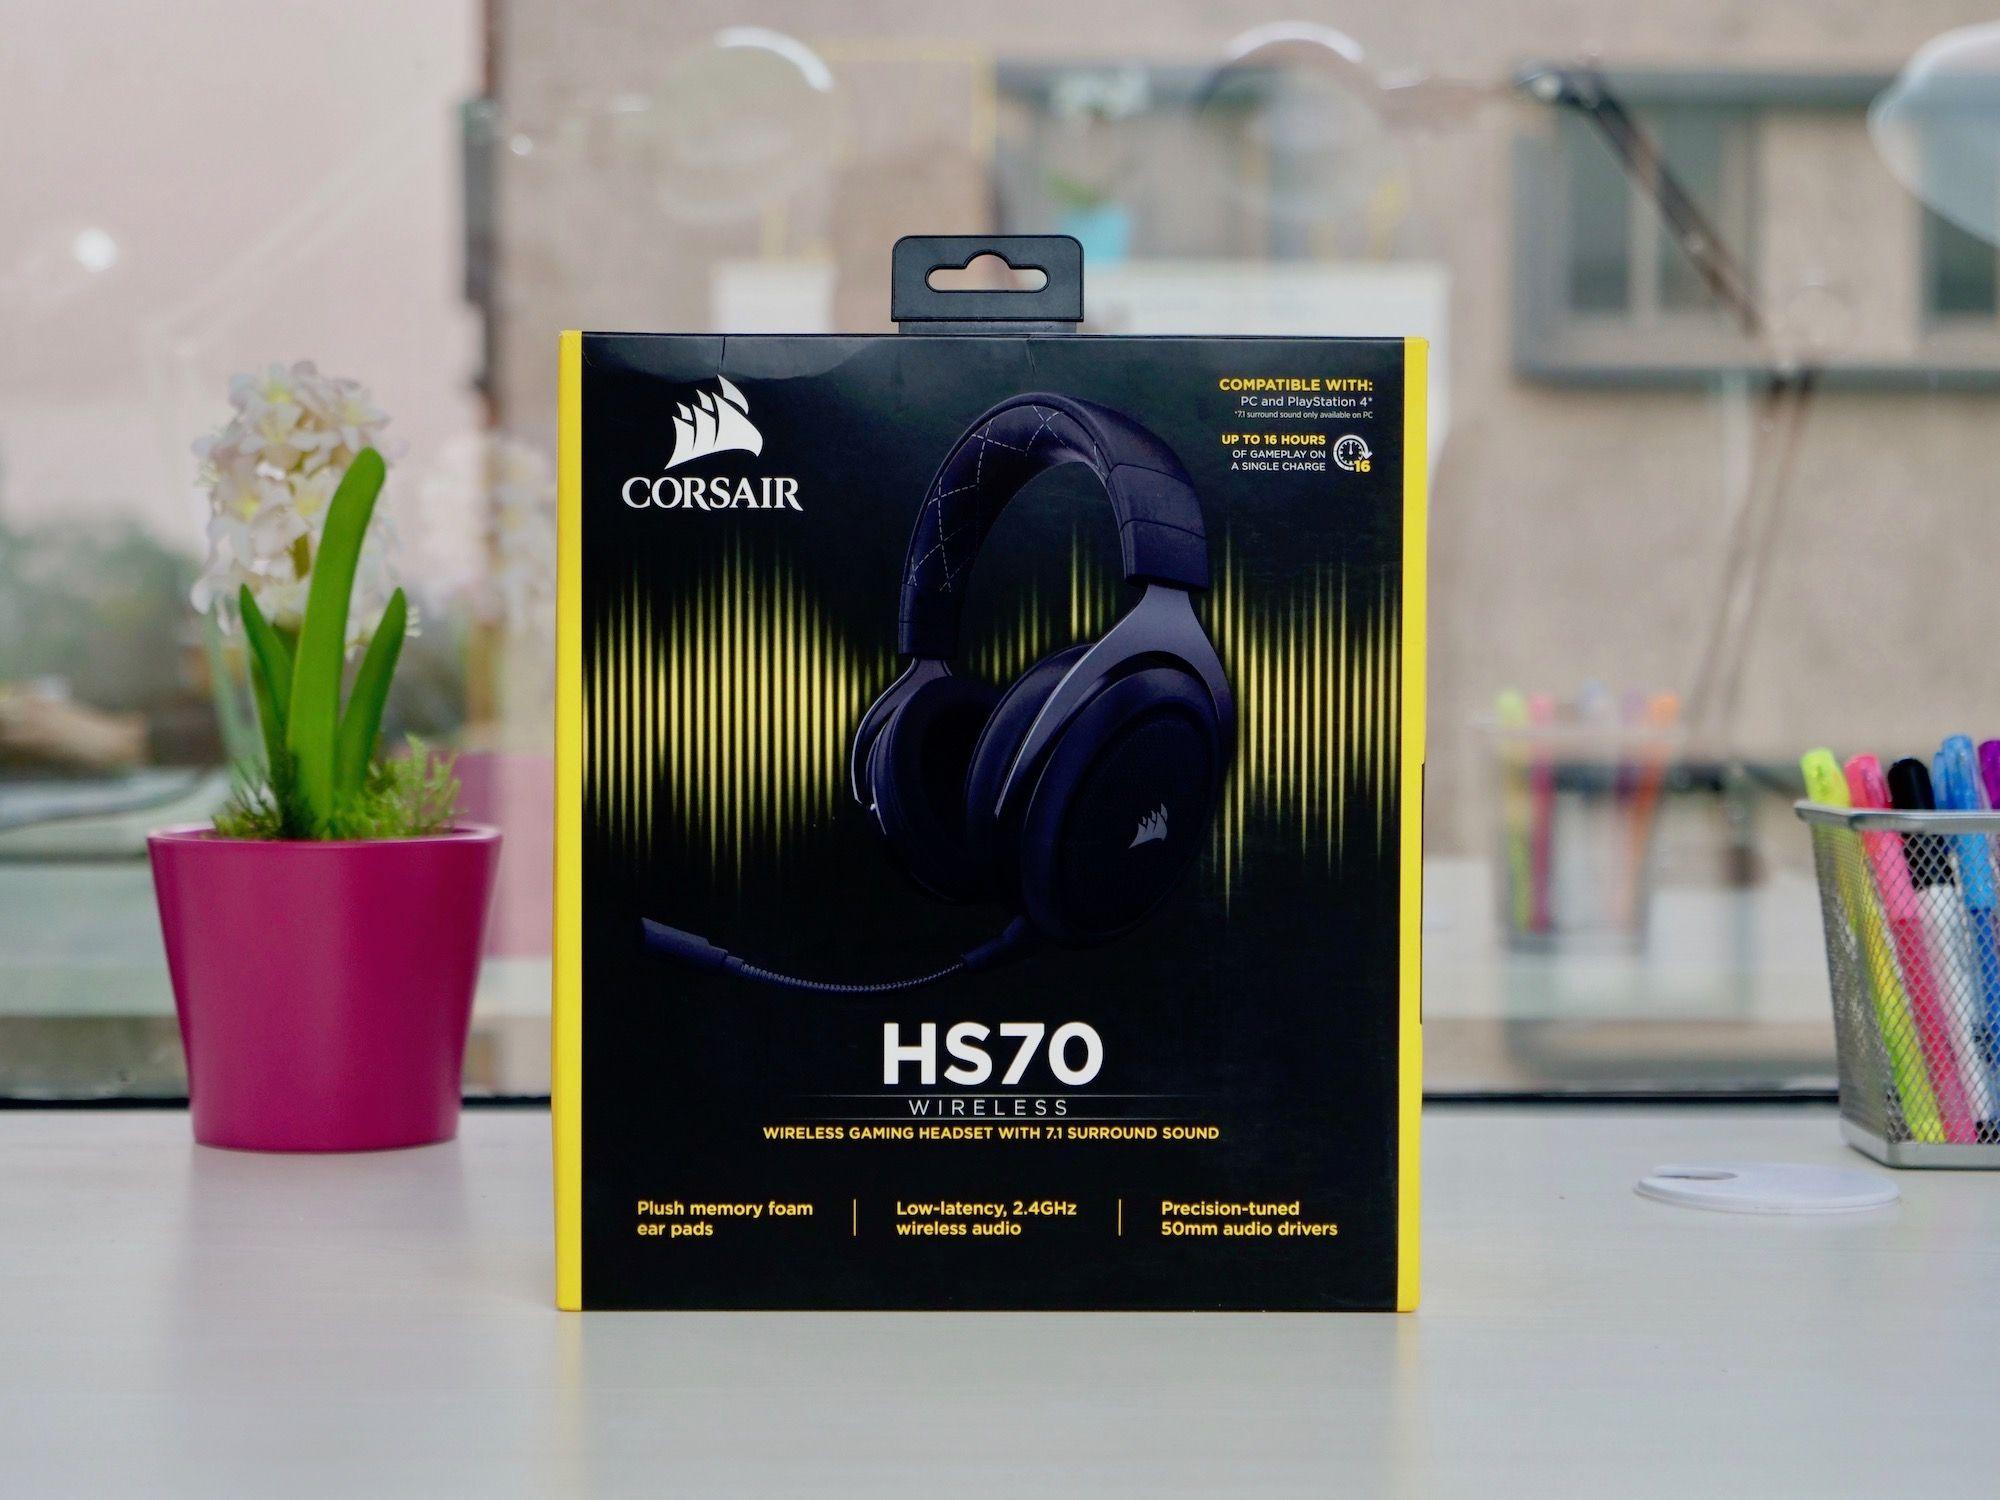 Corsair HS70 Review: Good Wireless Gaming Headset Under $100 - MySmartPrice